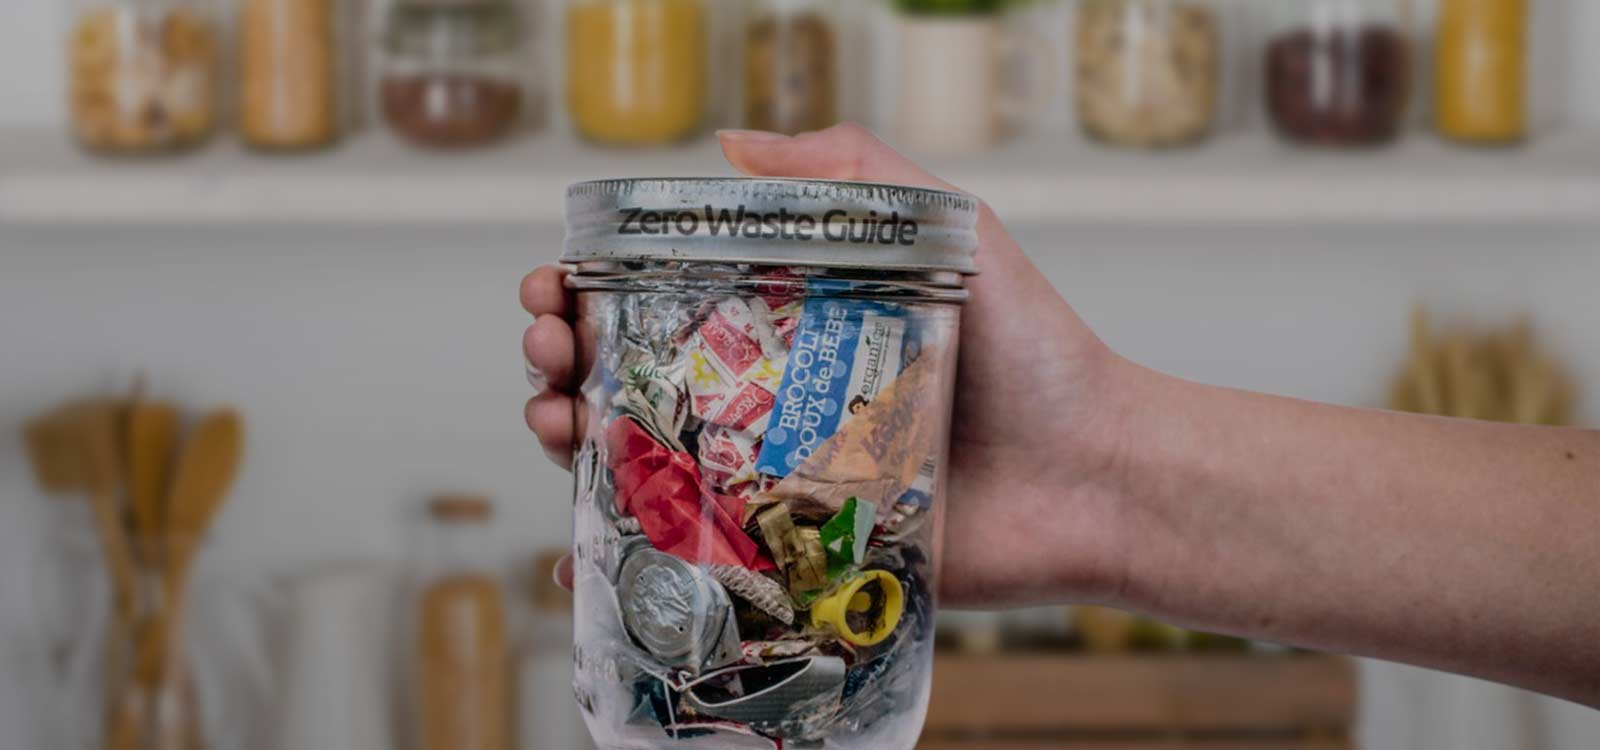 beginners-guide-for-zero-waste-header